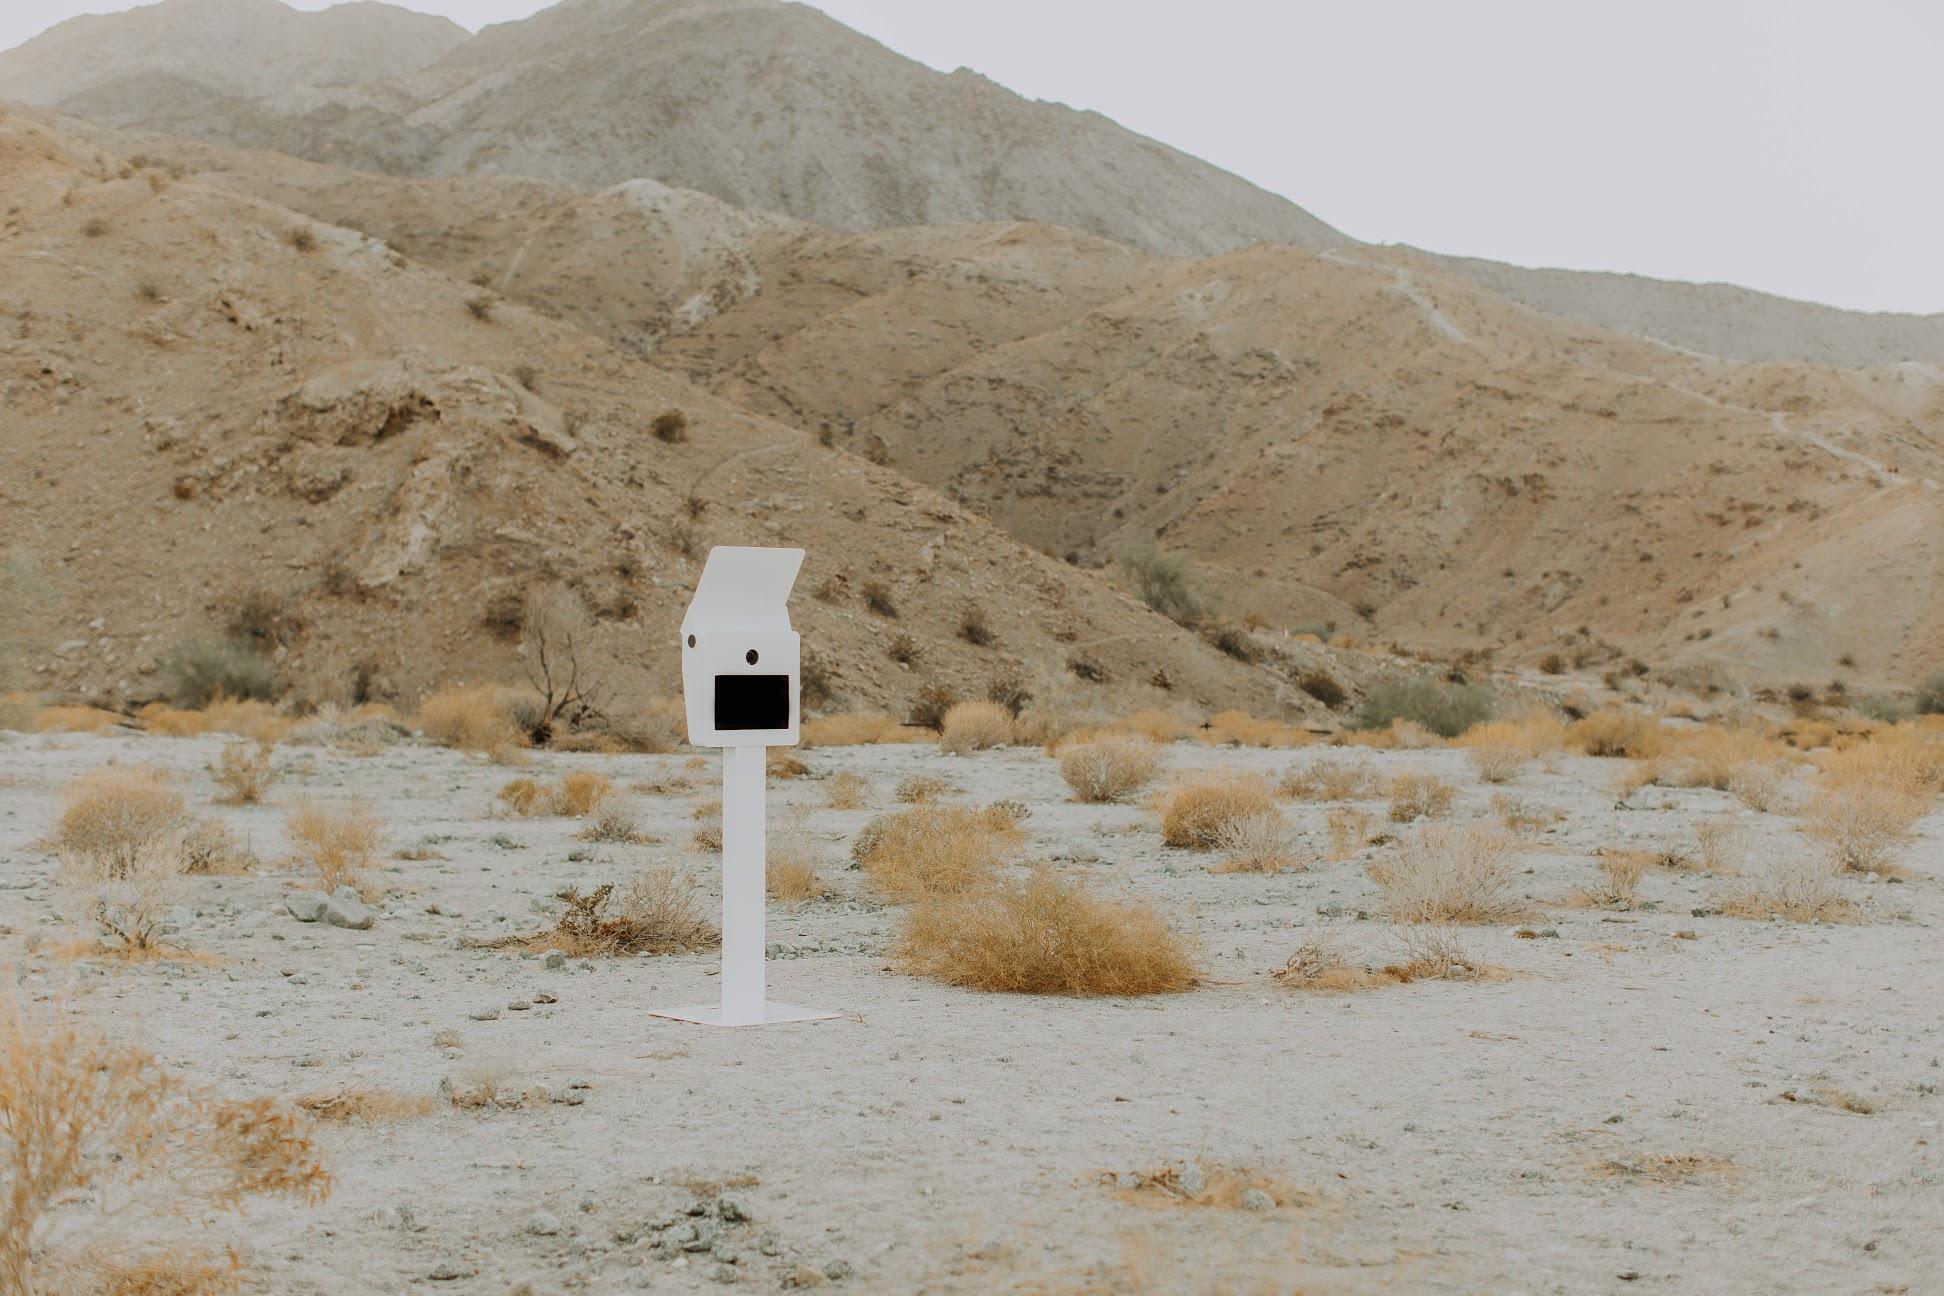 Desert Luna Photobooths